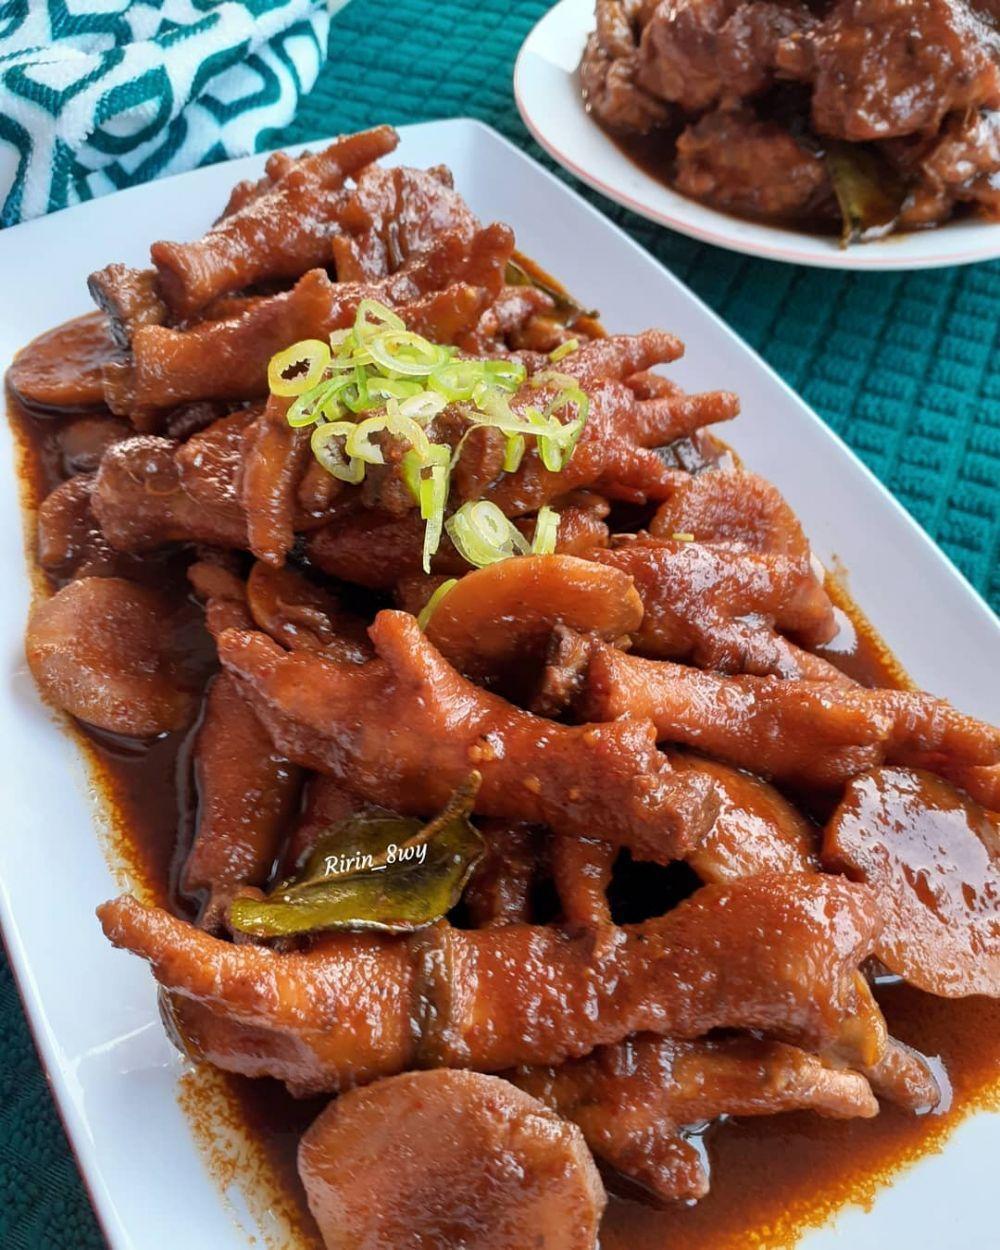 20 Resep Masakan Ayam Paling Enak Instagram Resep Masakan Resep Ayam Resep Masakan Sehat